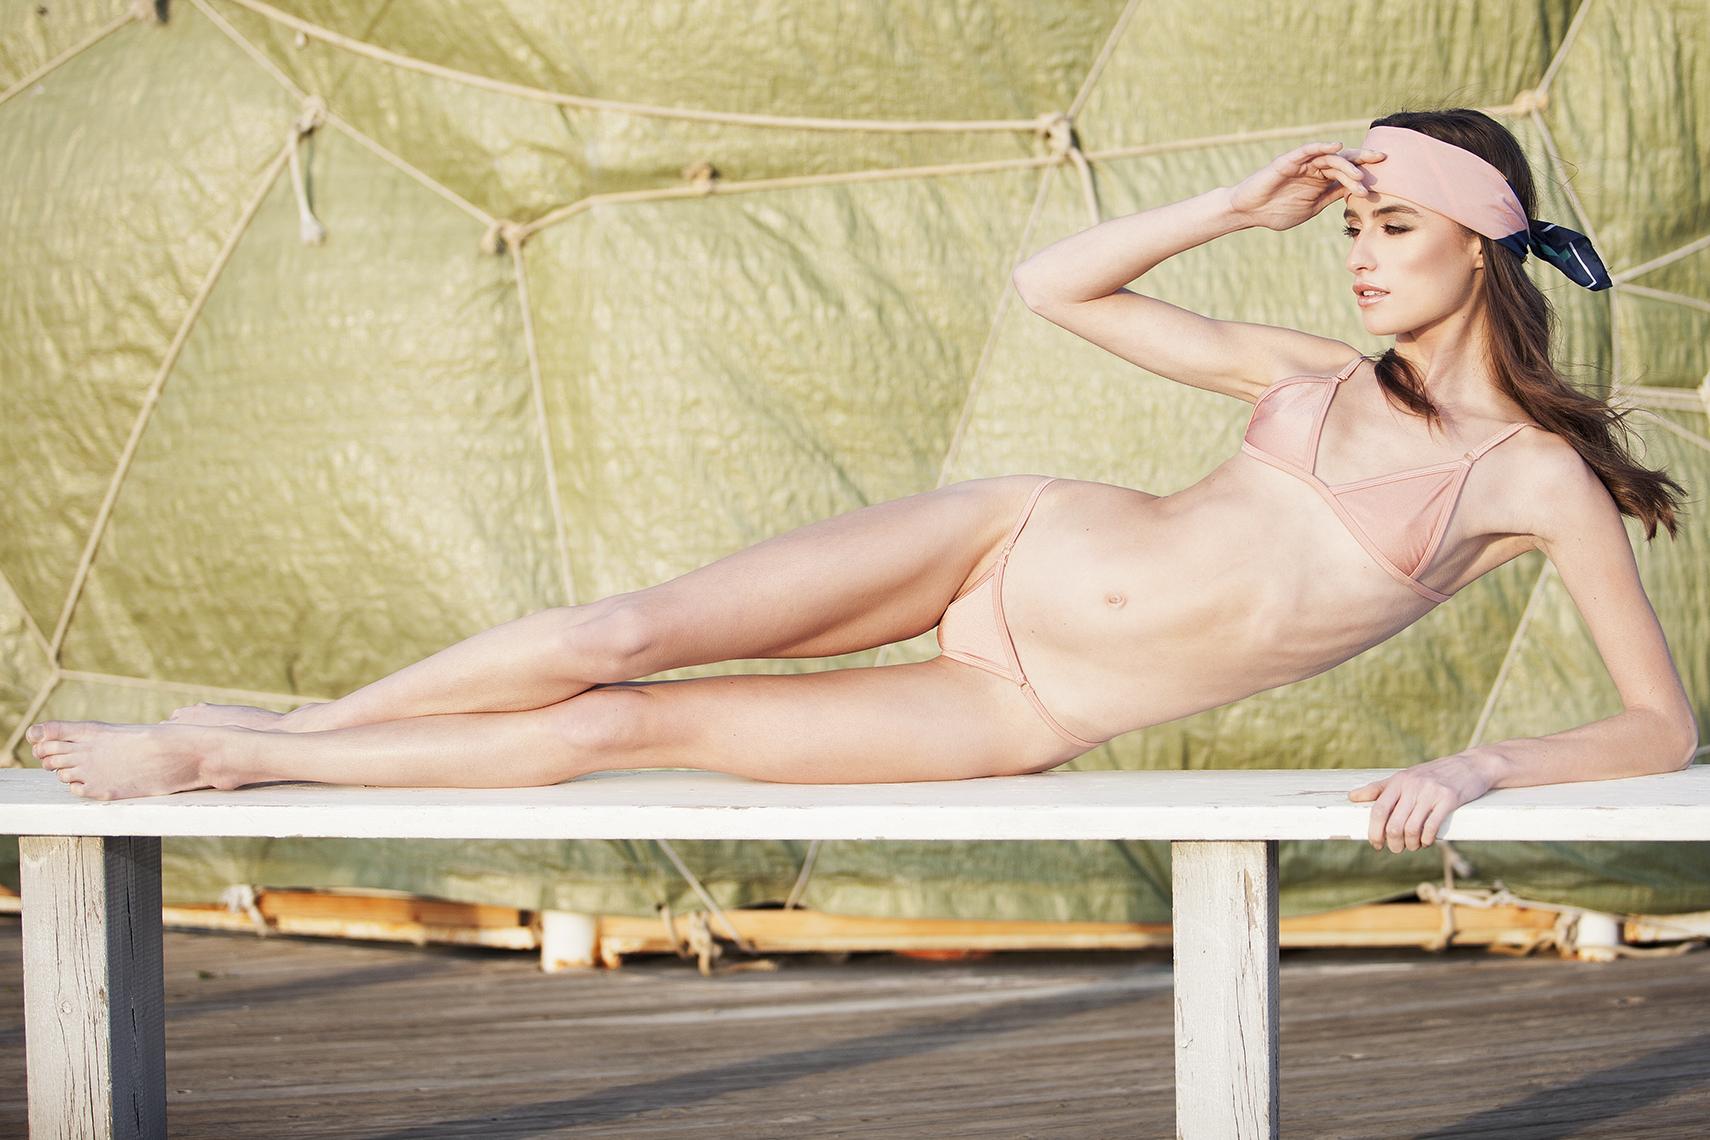 marbella-fotografo-juanjosobrino-moda-5